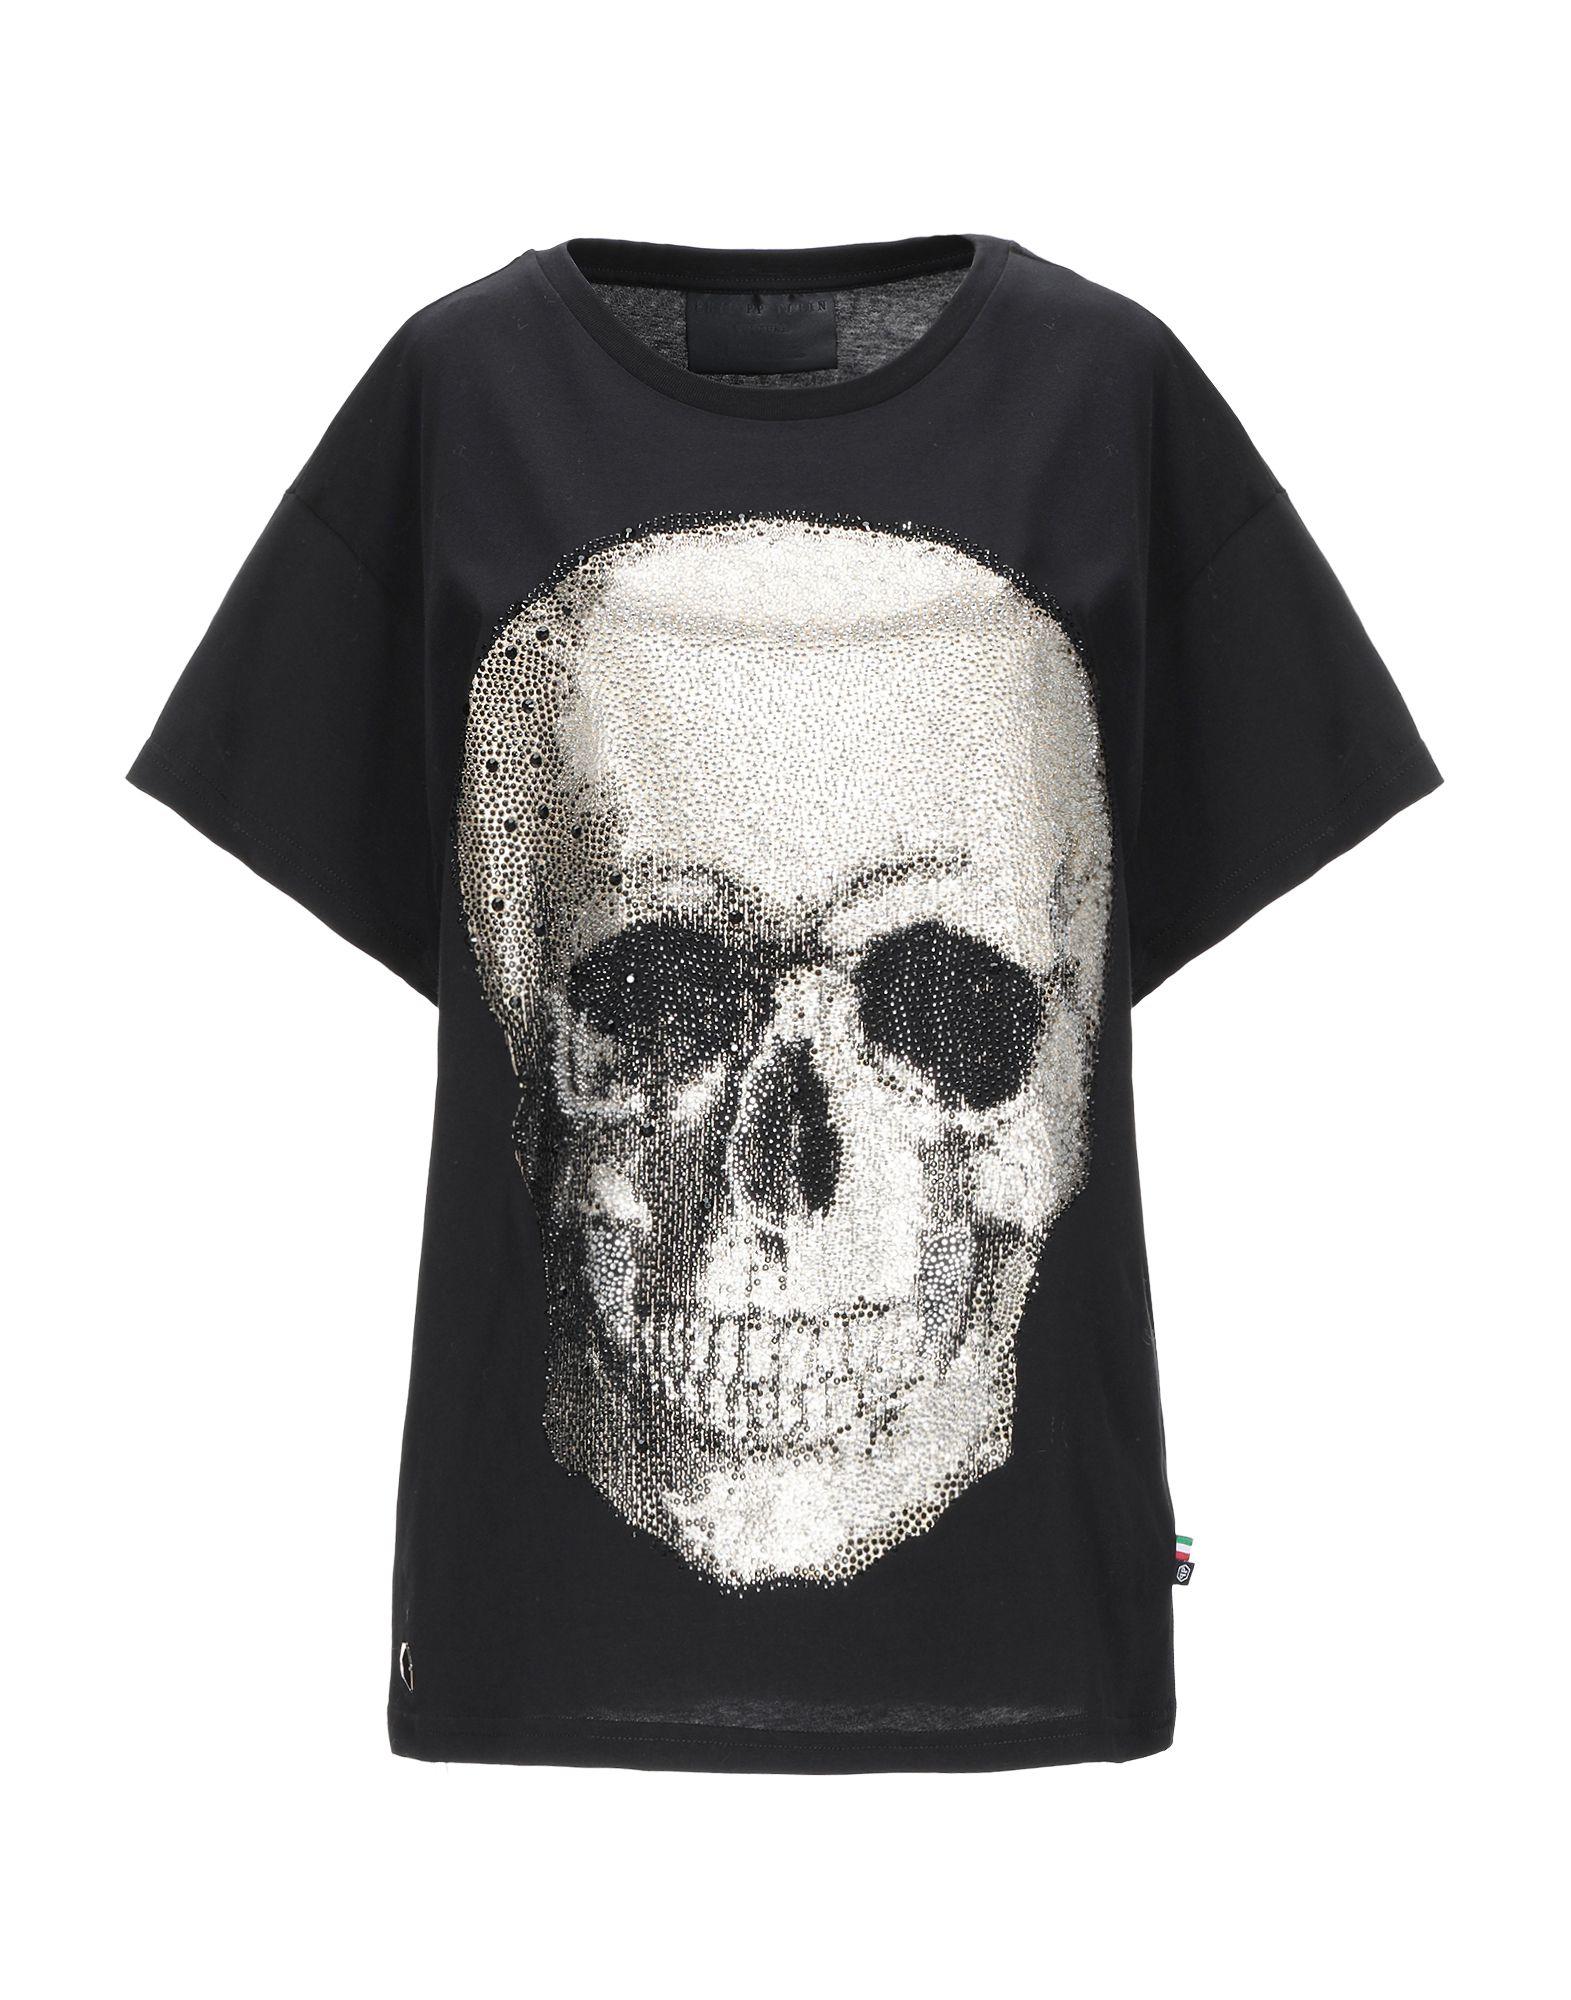 T-Shirt Philipp Philipp Philipp Plein donna - 12348644IN 824